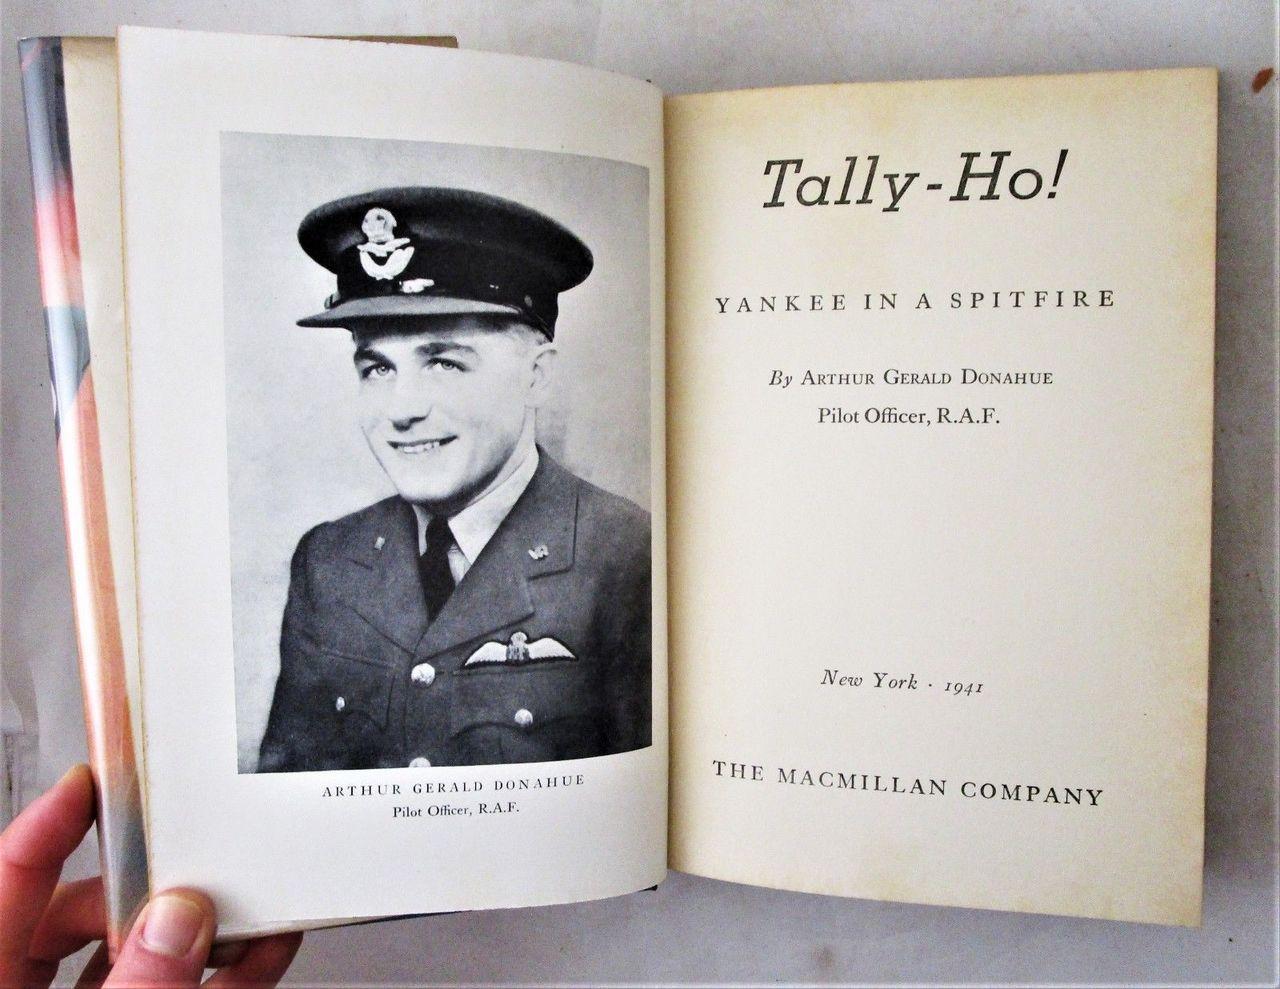 TALLY-HO! YANKEE IN A SPITFIRE, by Arthur G. Donahue - 1941 WWII Pilot Bio w/DJ